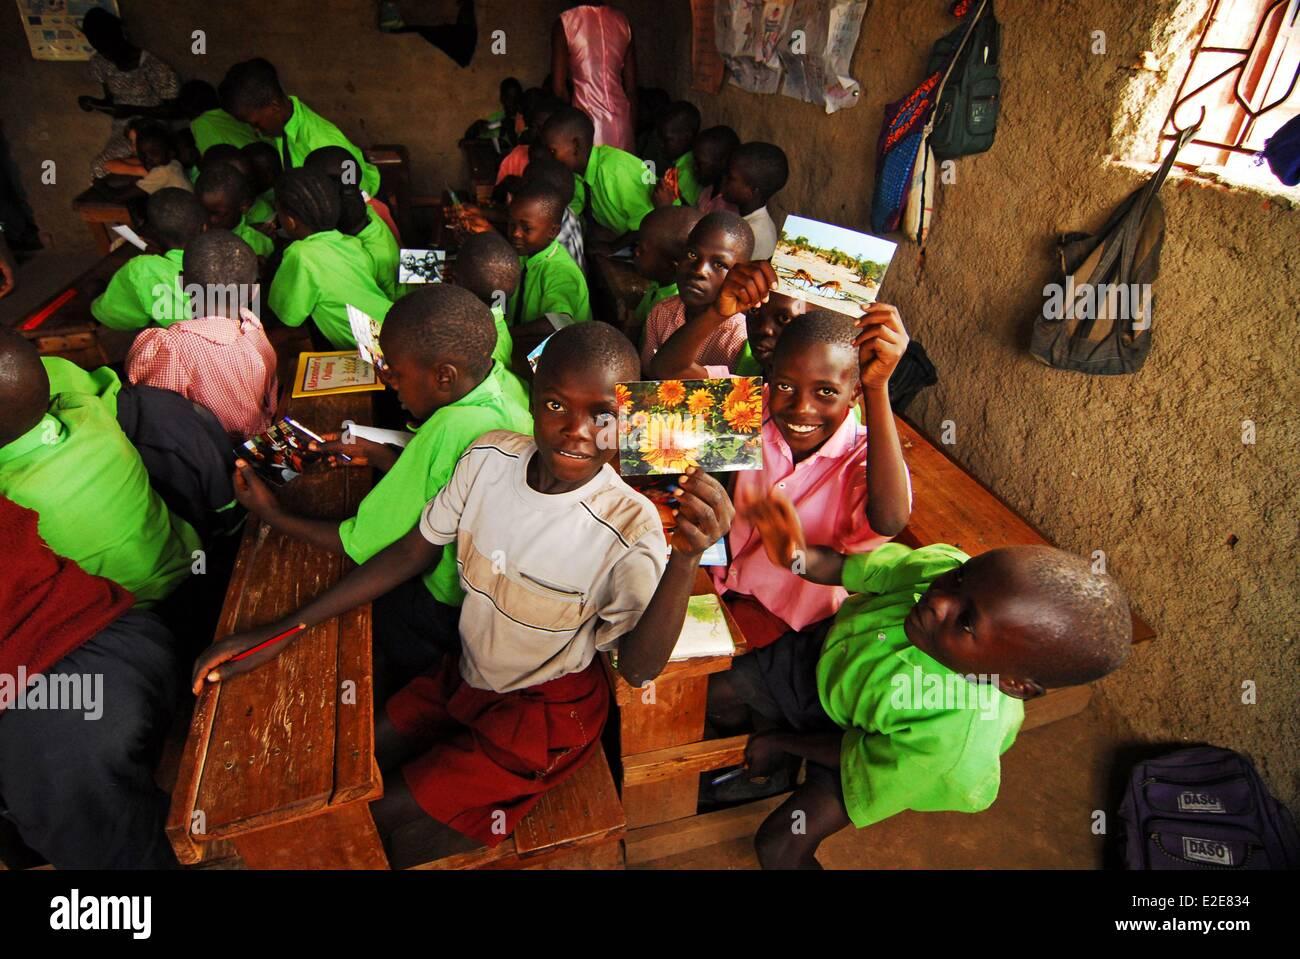 Kenya, Kakamega, schoolchildren showing photographs in classroom - Stock Image